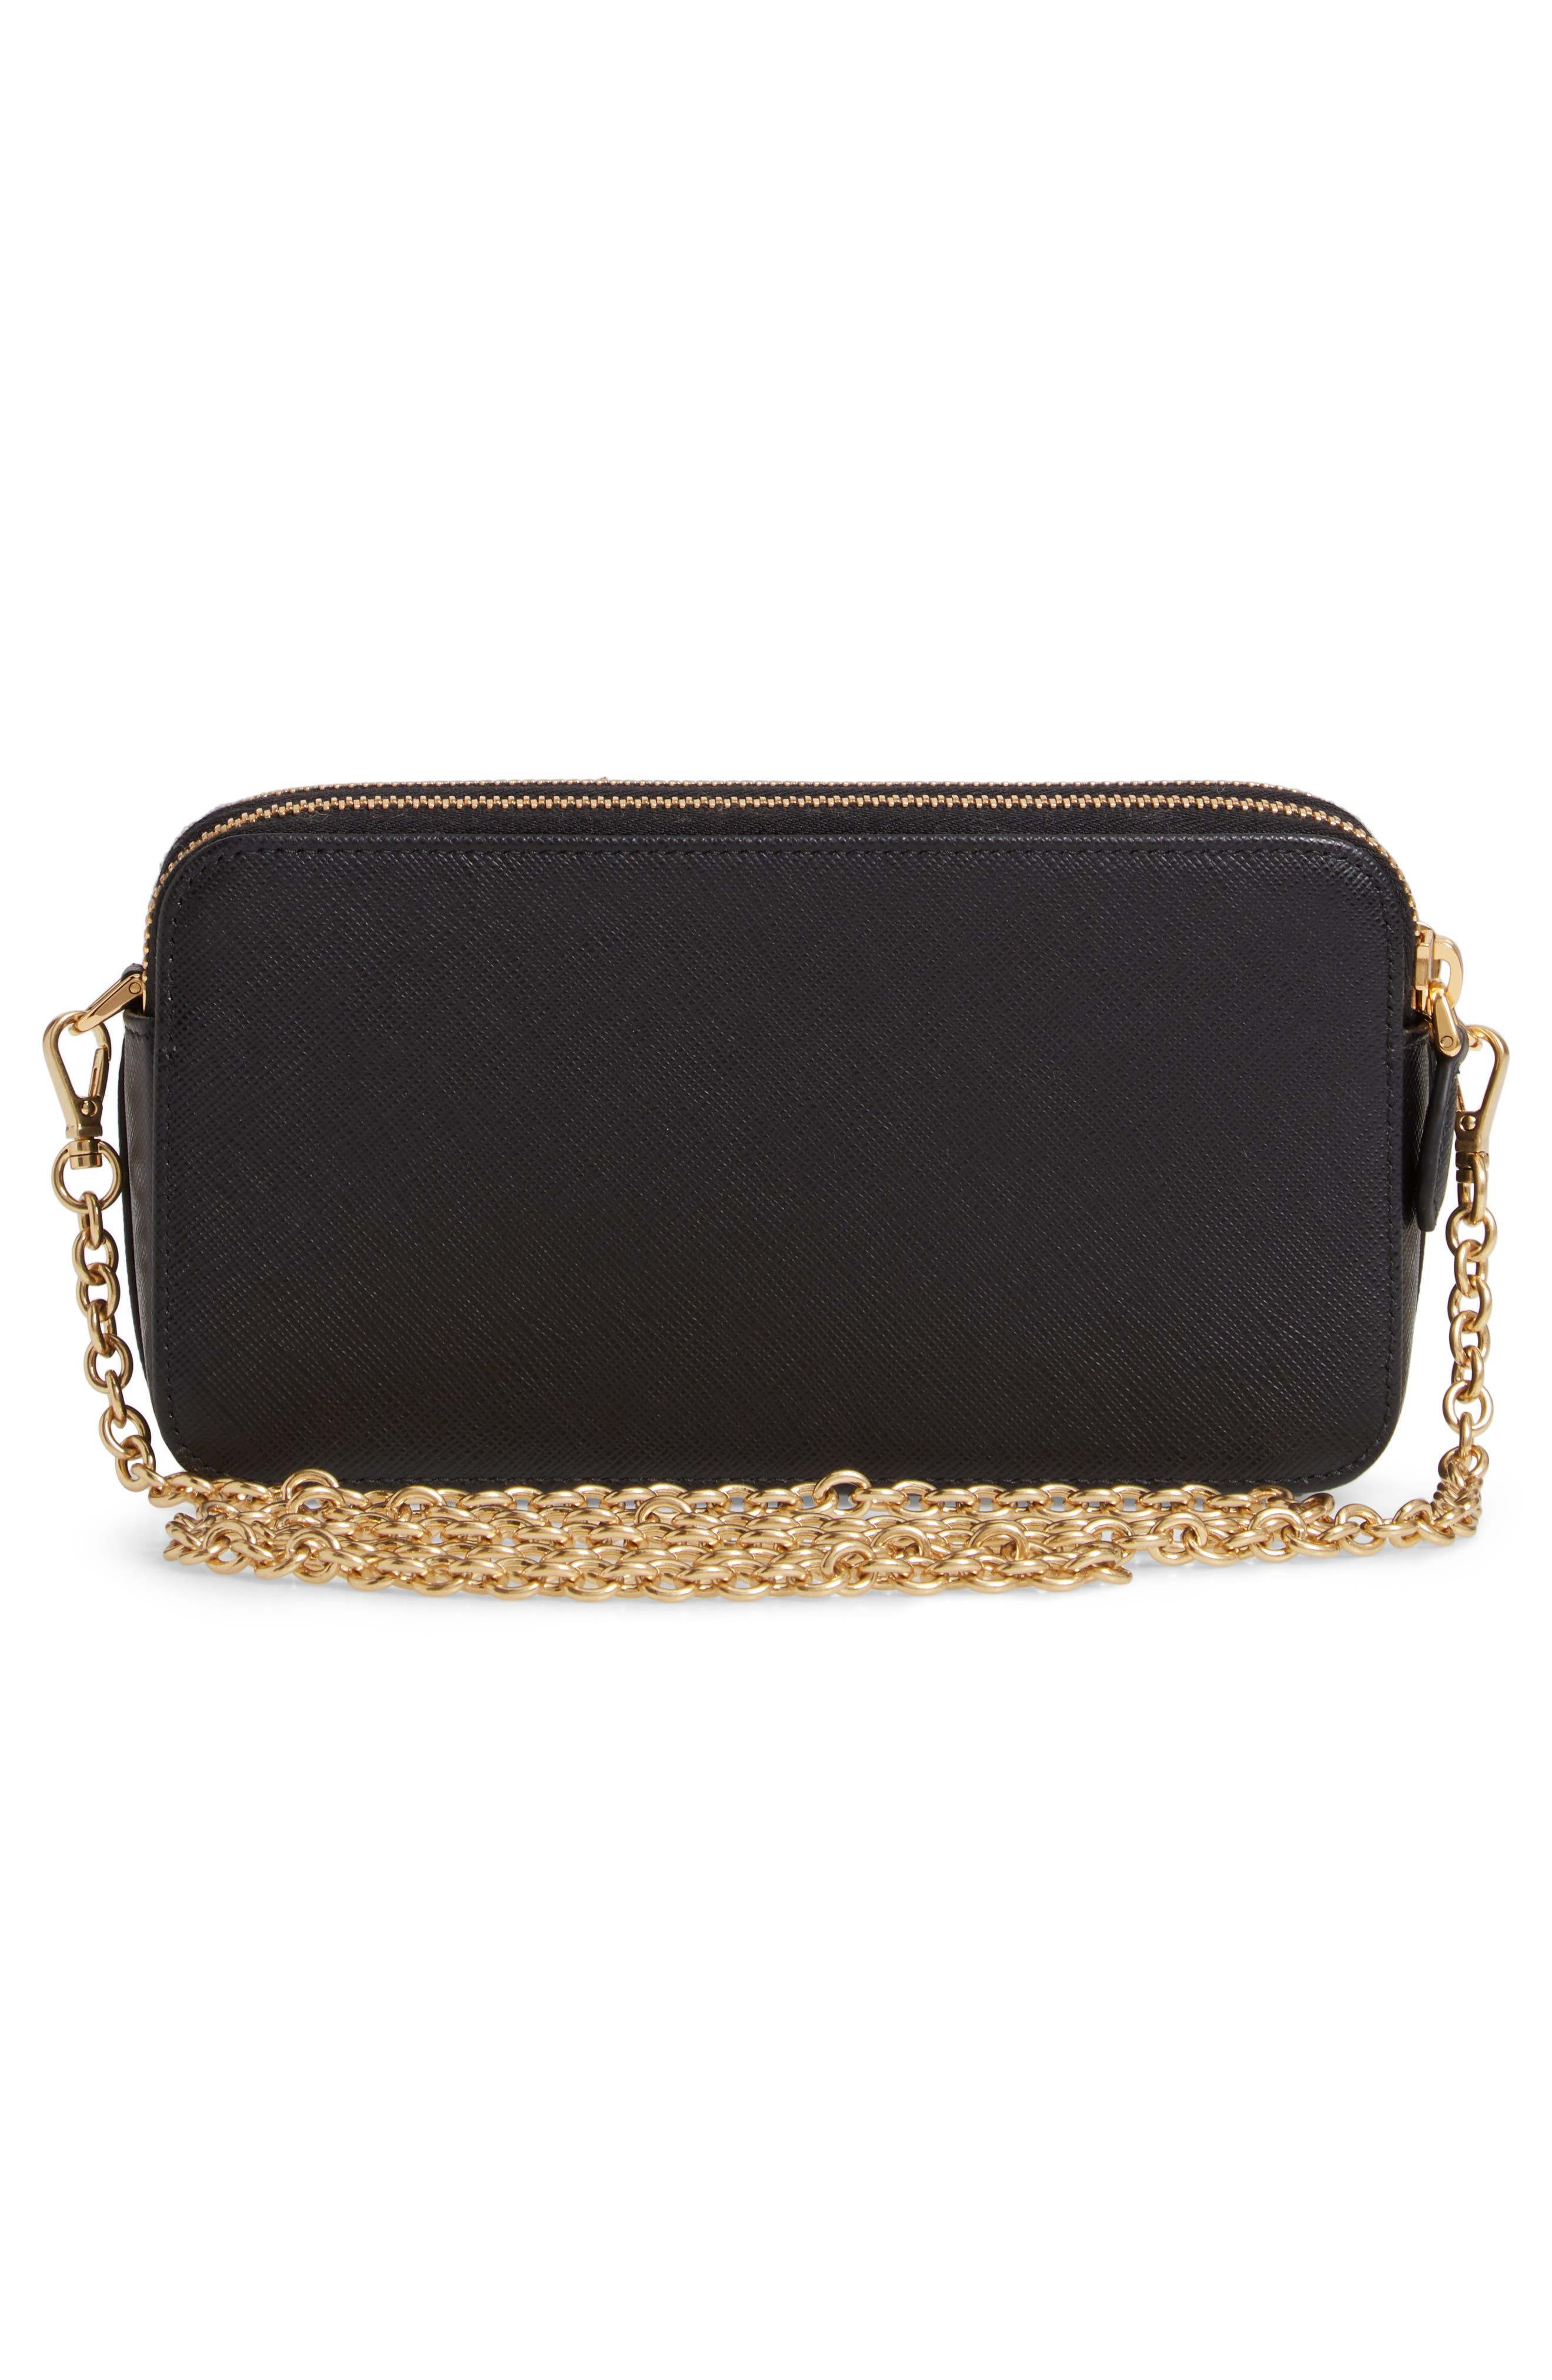 Small Double Compartment Zip Saffiano Leather Crossbody Bag,                             Alternate thumbnail 3, color,                             NERO